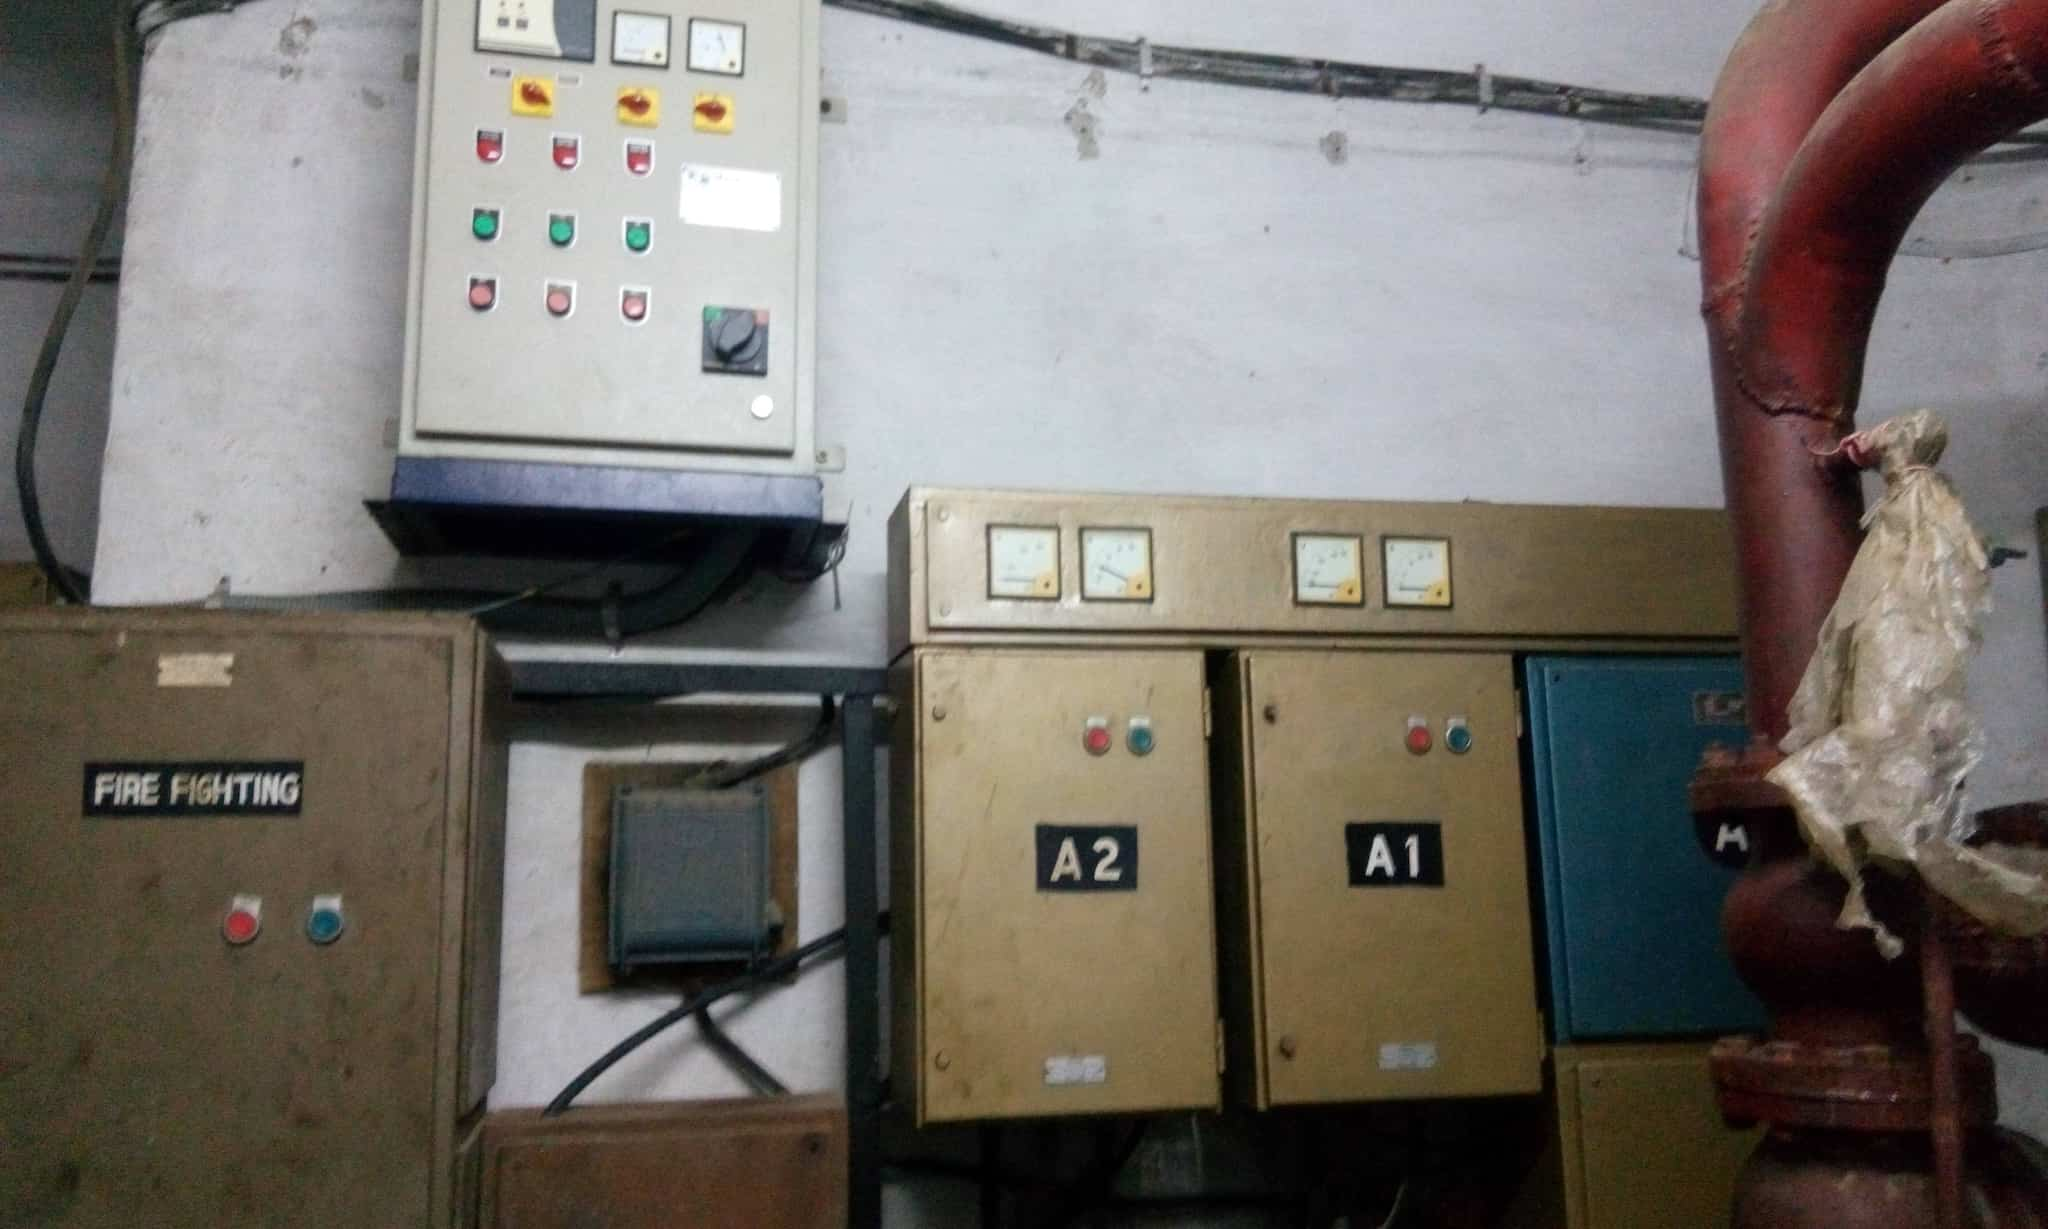 Super Pump Service Santacruz East Water Repair Services In Fire Electrical Wiring Mumbai Justdial